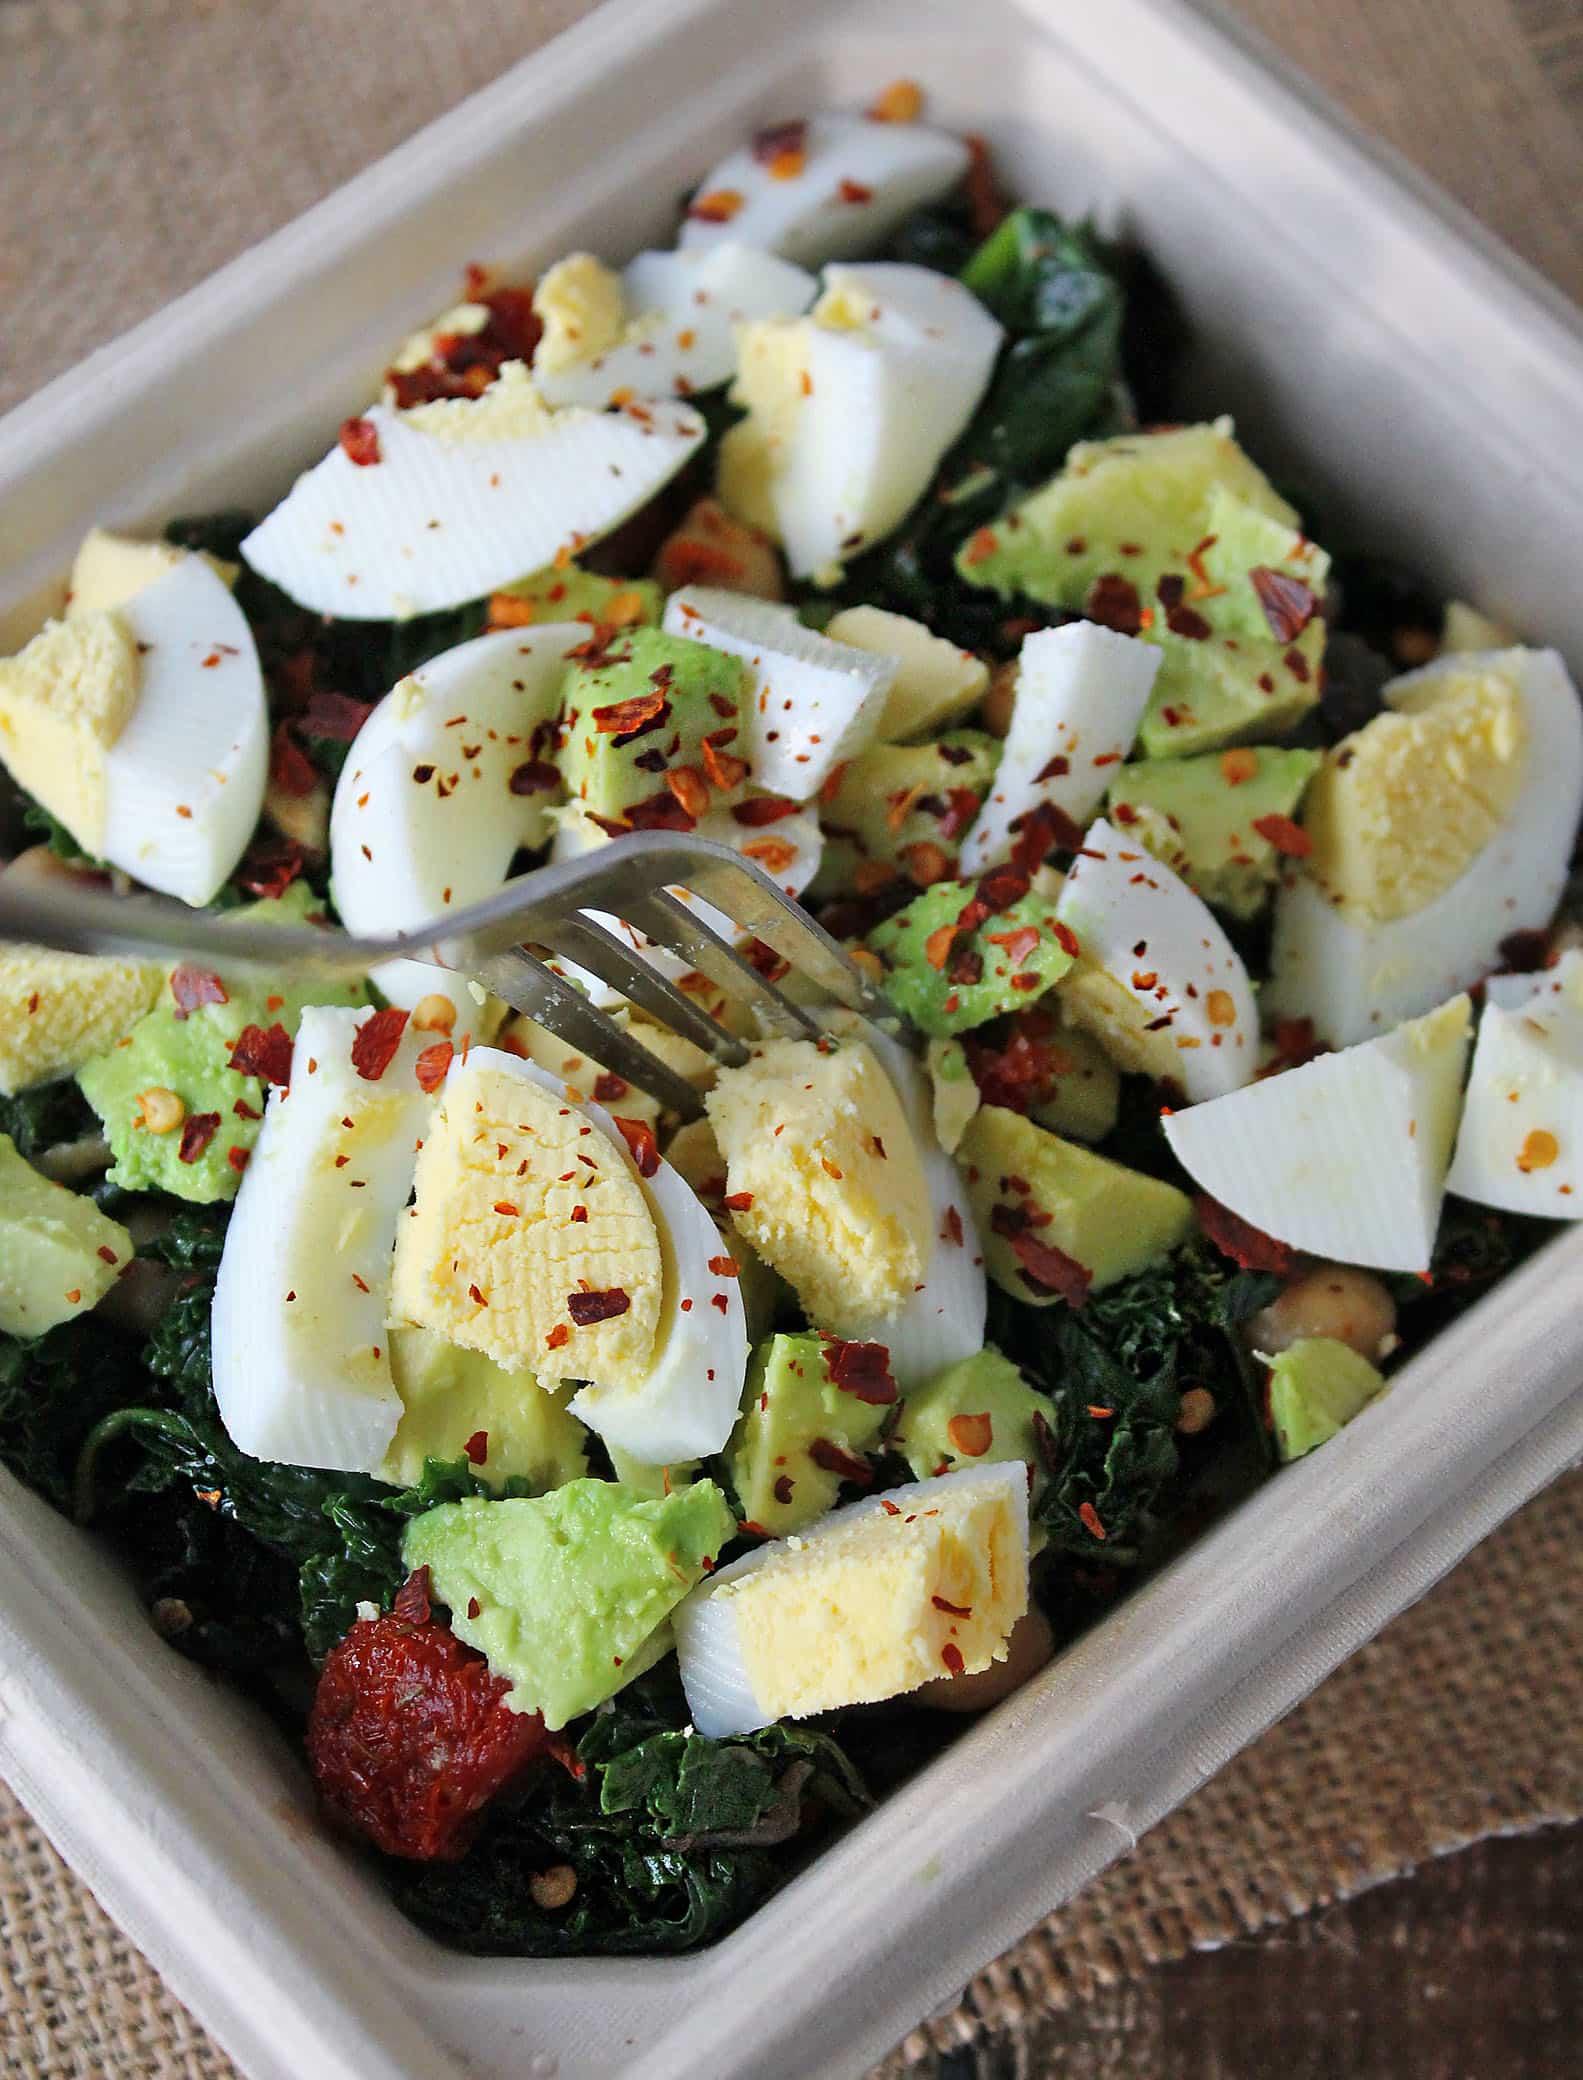 Sauteed-Kale-Chickpea-Eggs-Avocado-#HeatAndEat